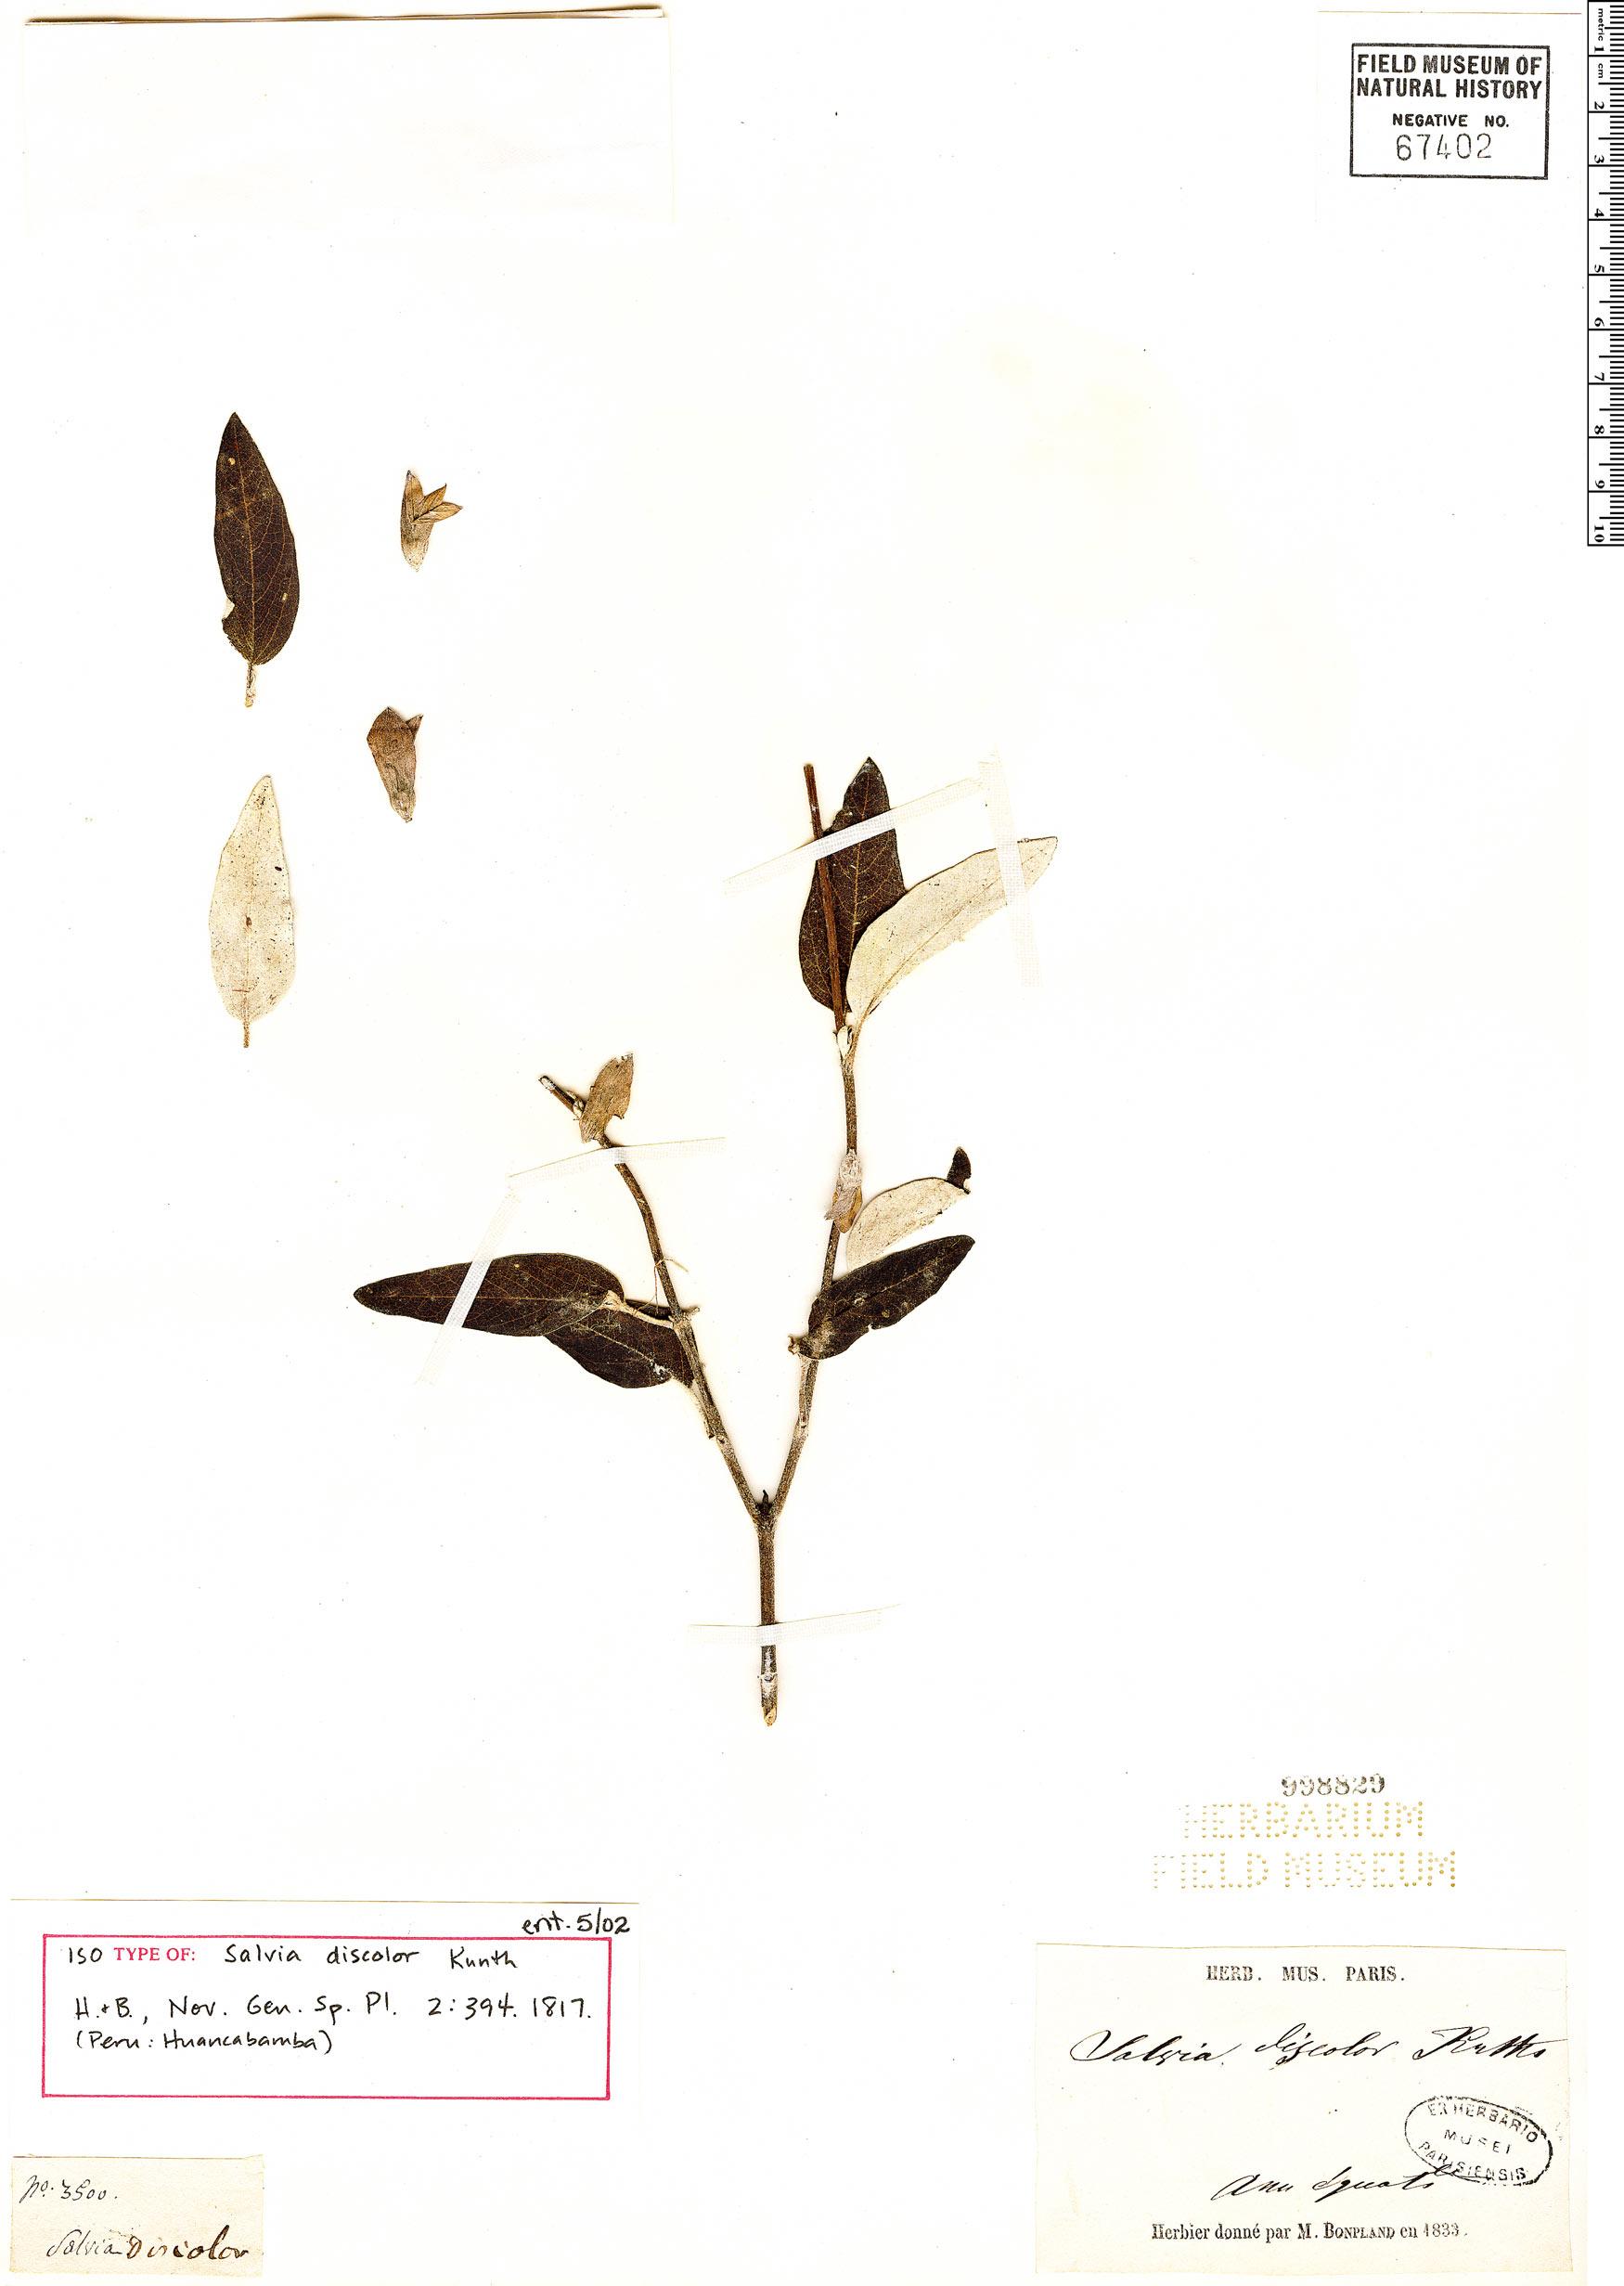 Specimen: Salvia discolor